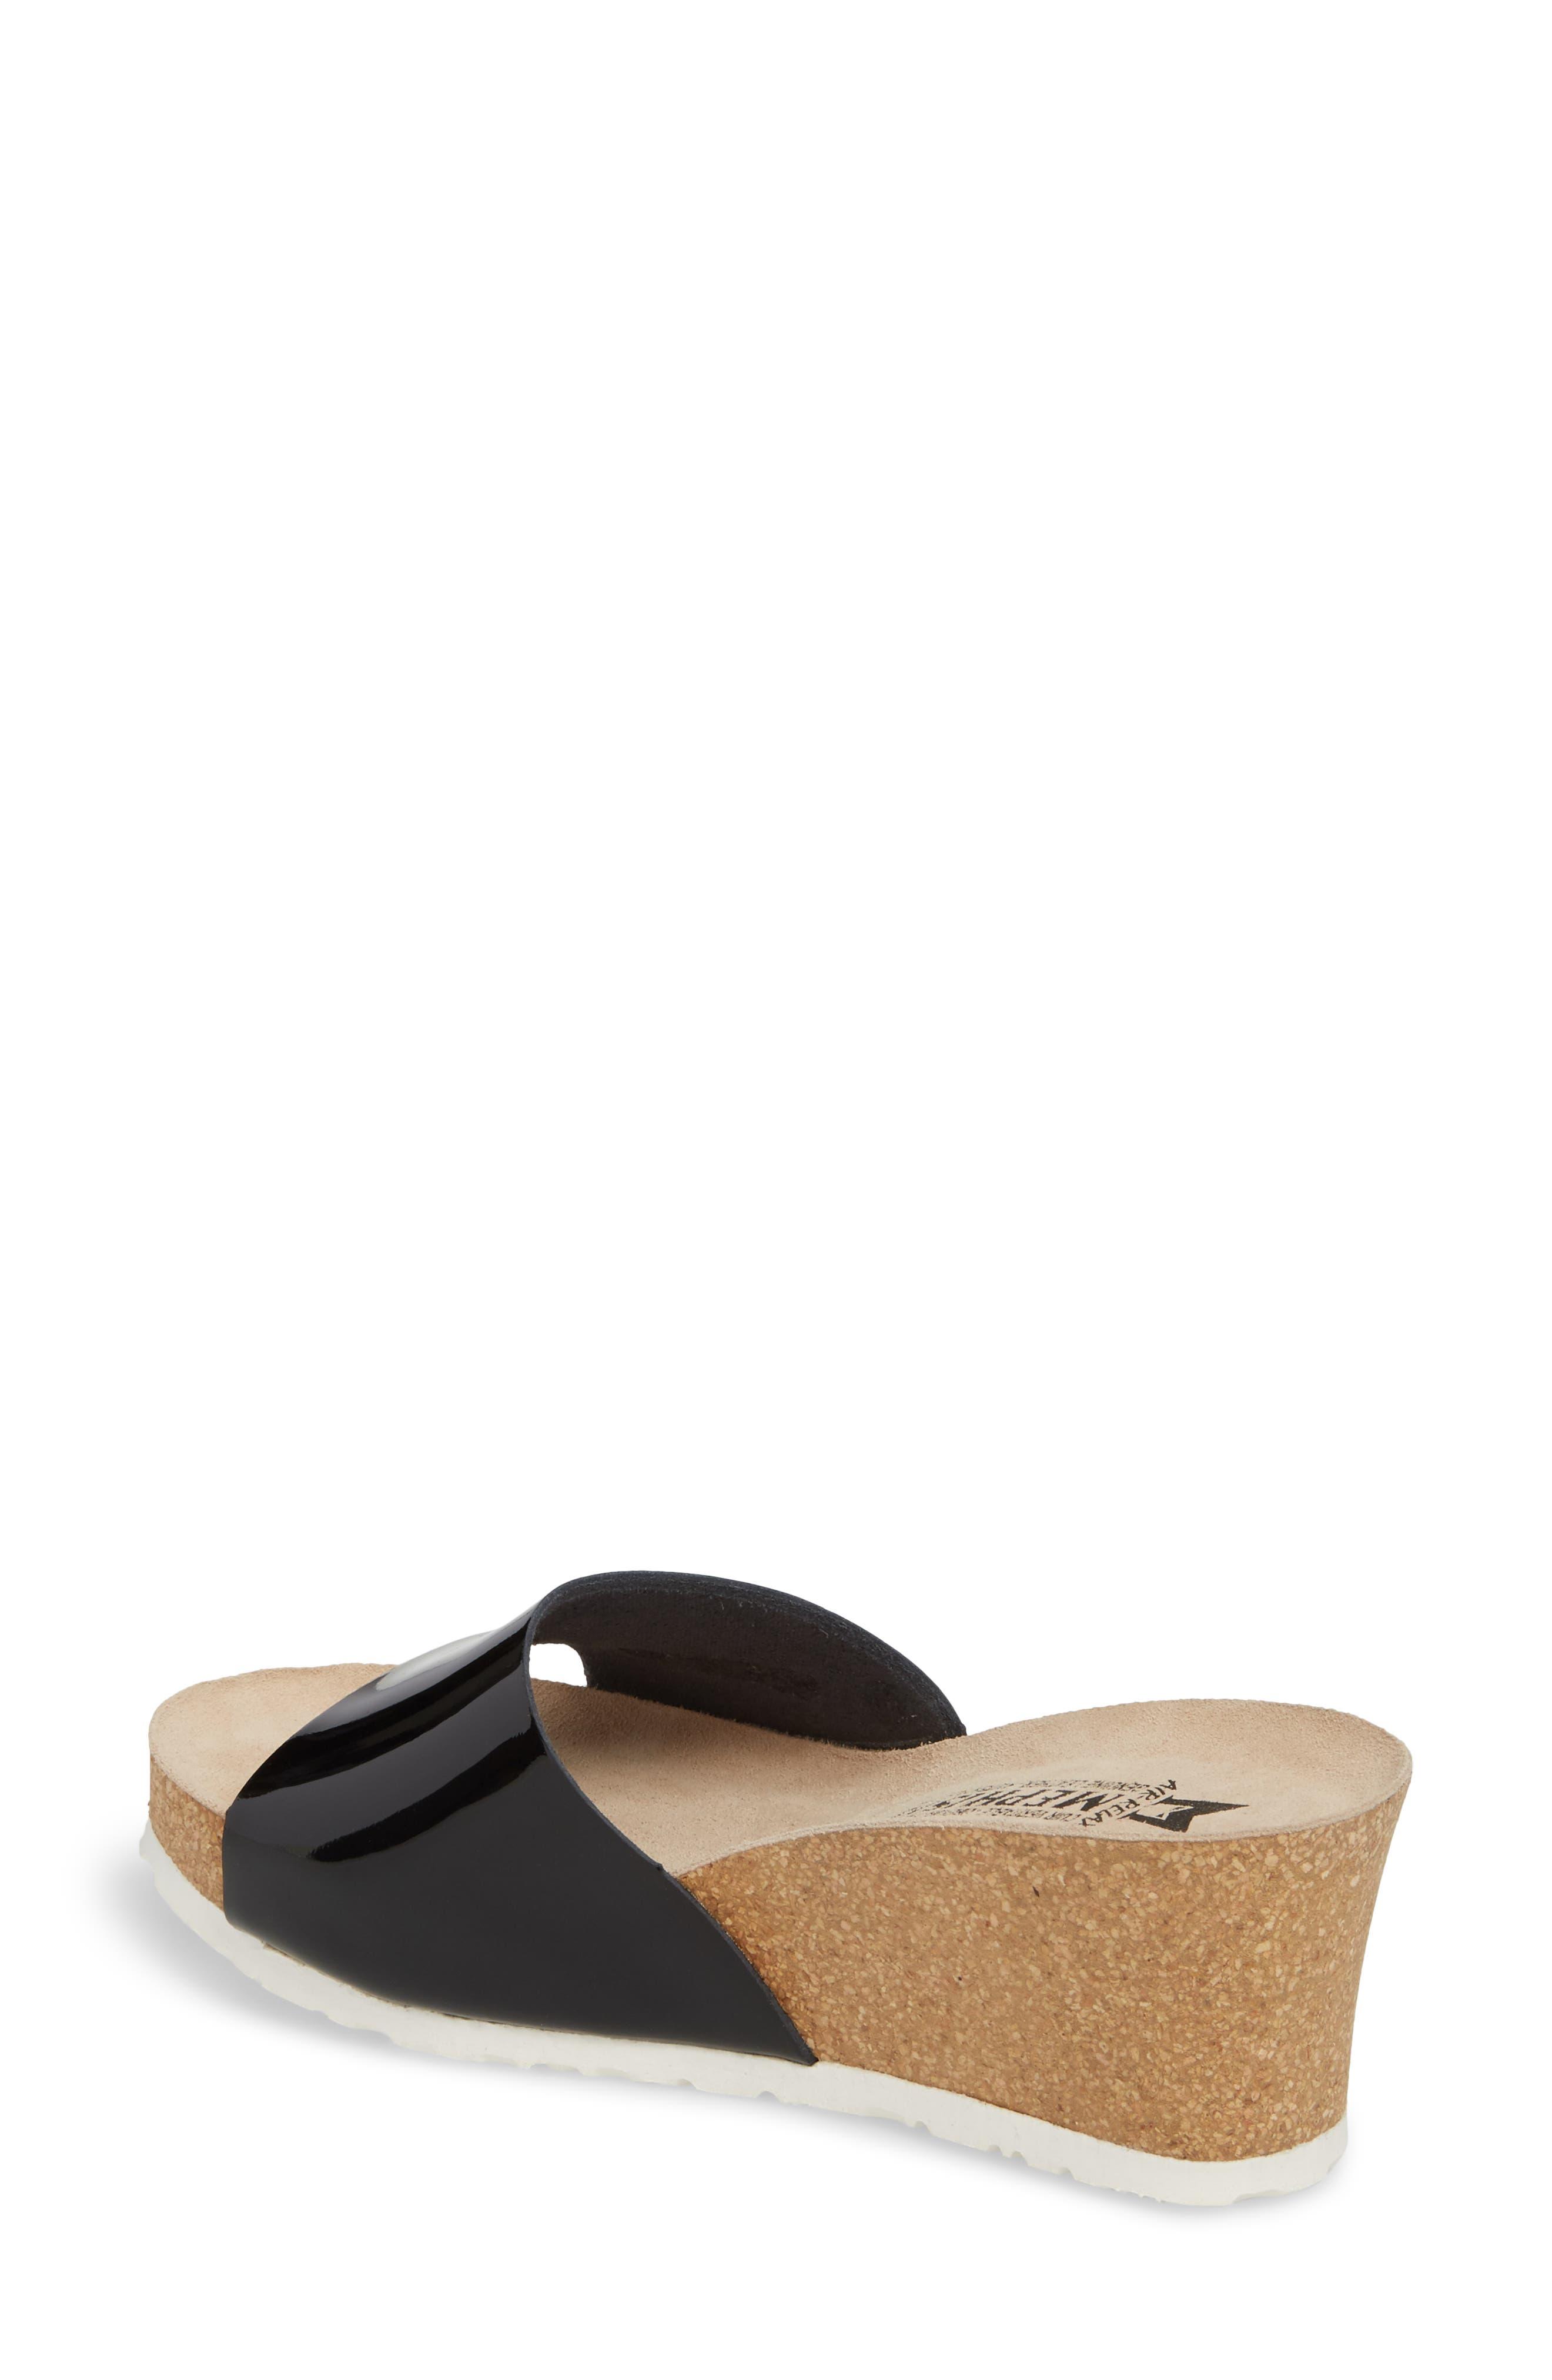 Lise Platform Wedge Sandal,                             Alternate thumbnail 2, color,                             Black